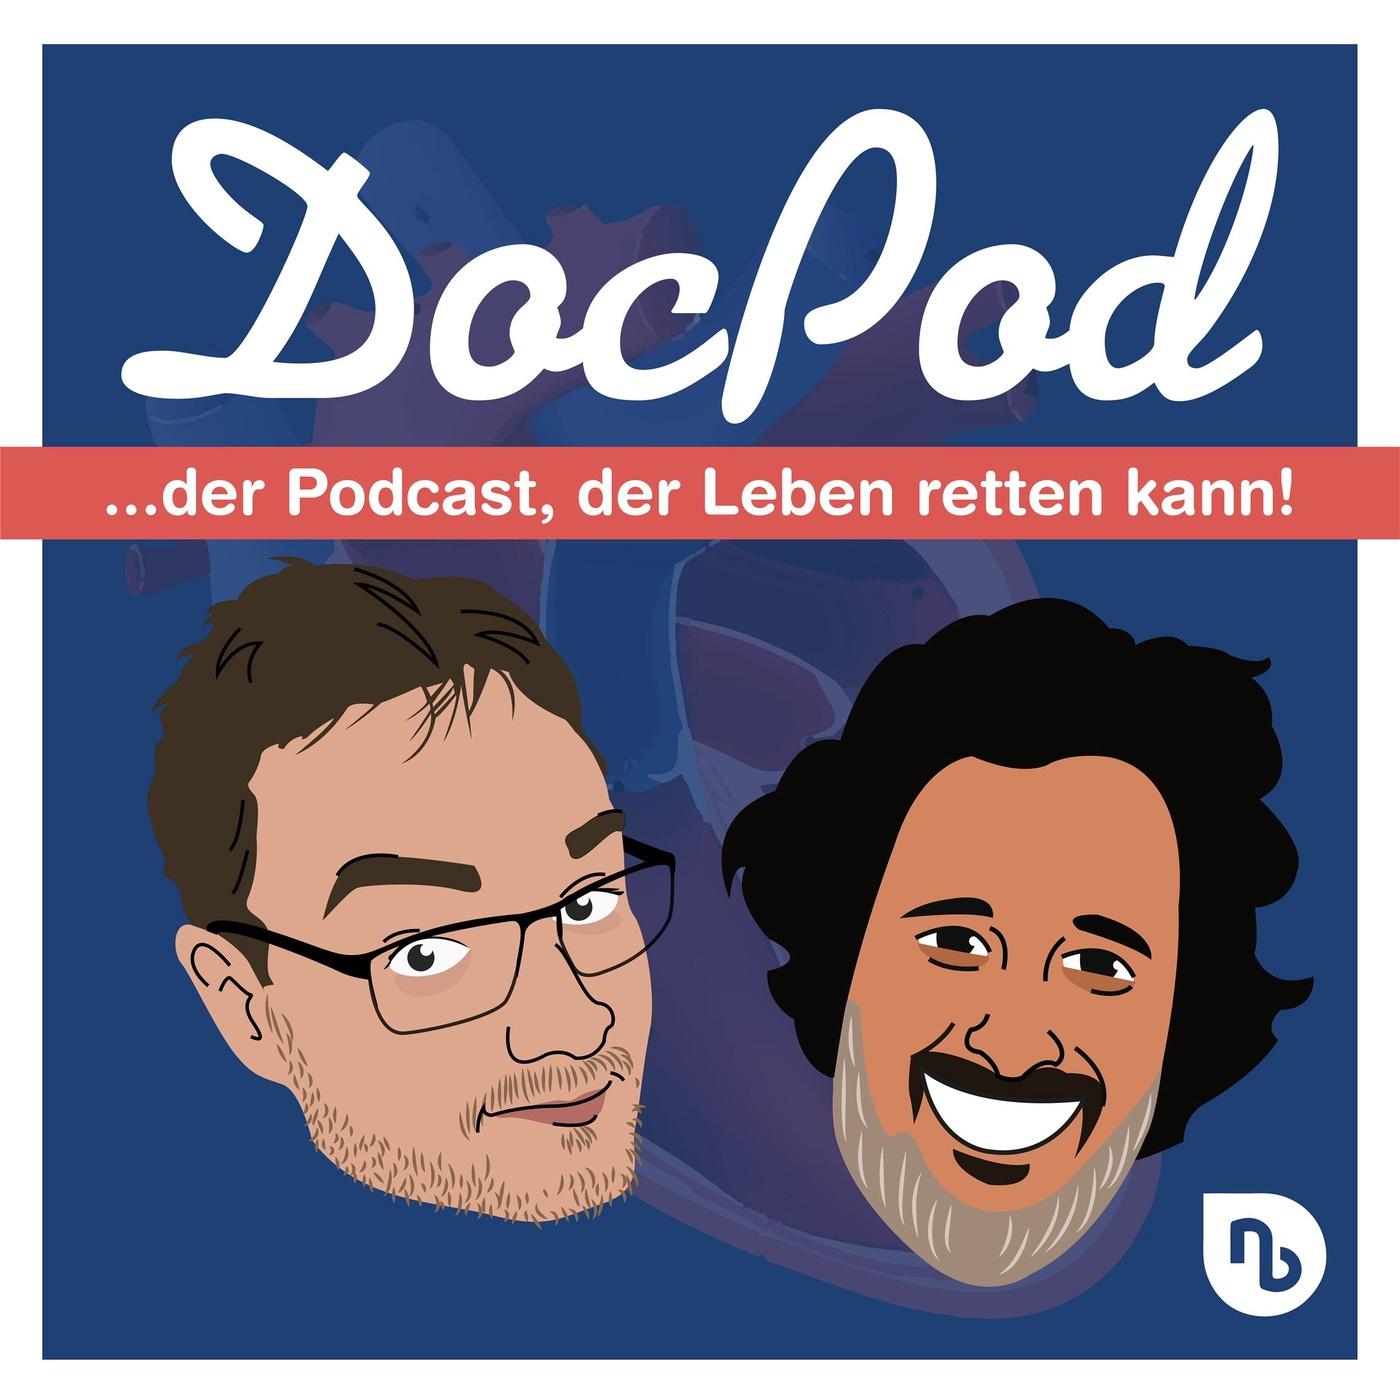 DocPod - Der Podcast, der Leben retten kann